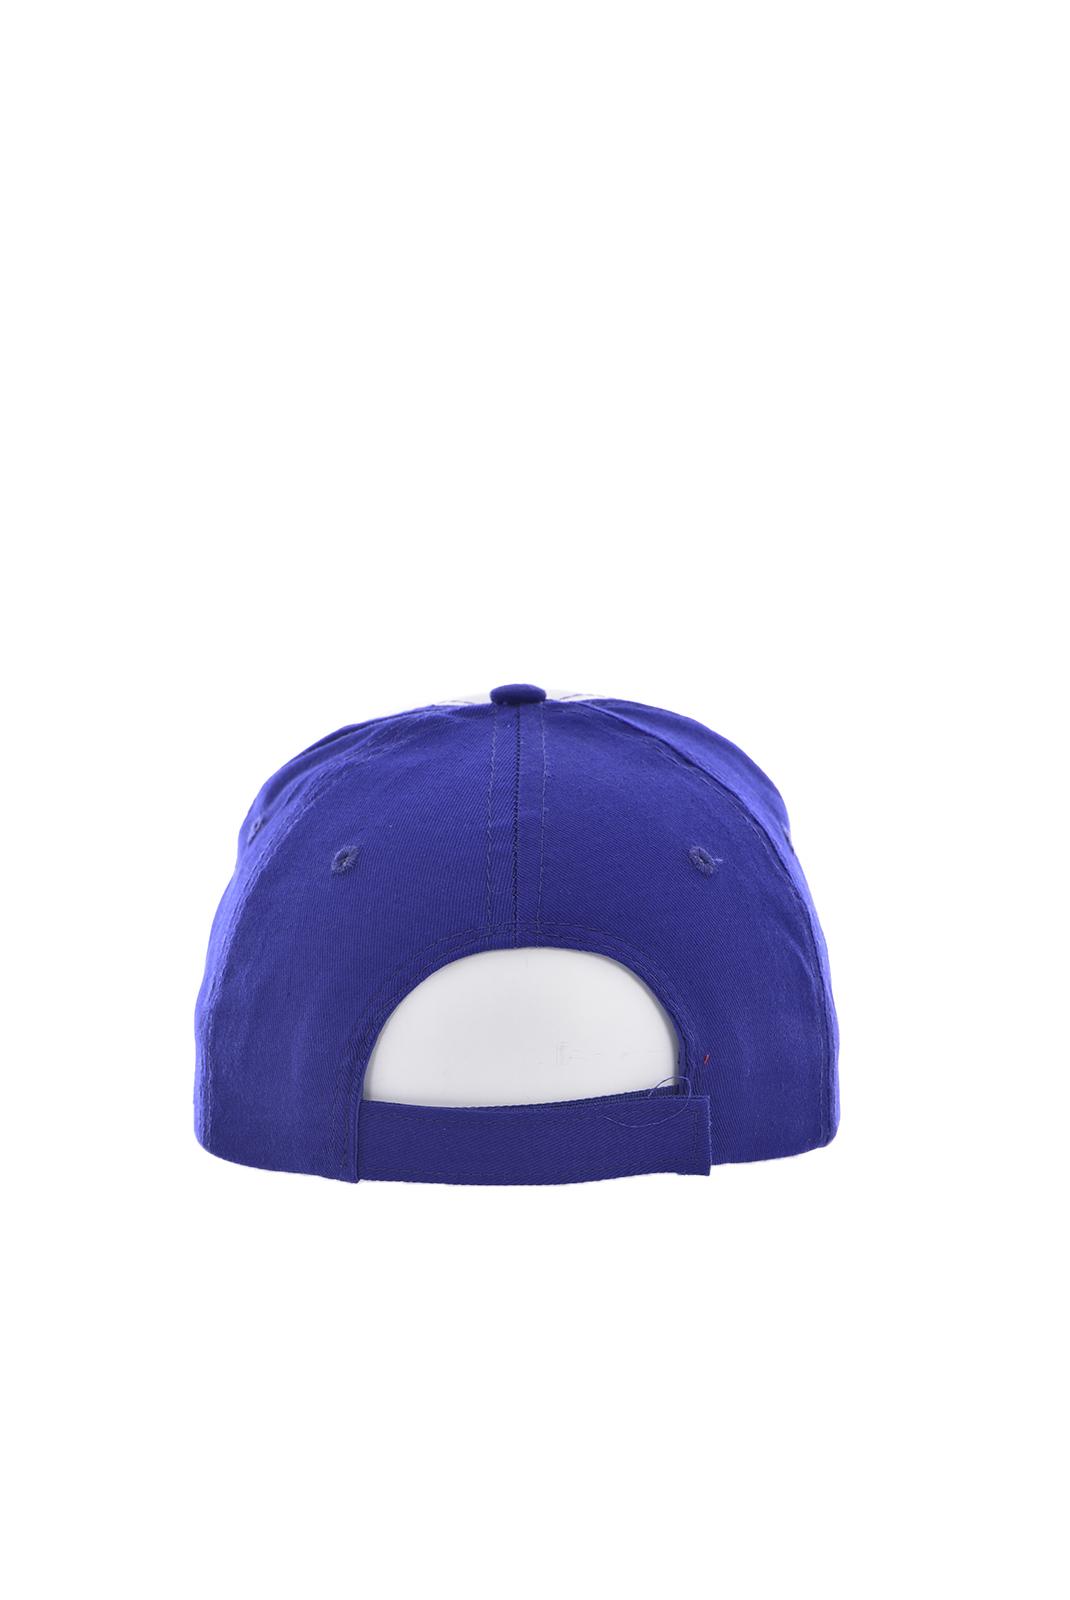 Bonnets / Casquettes  Nasa MULTI-BALL CAP RED